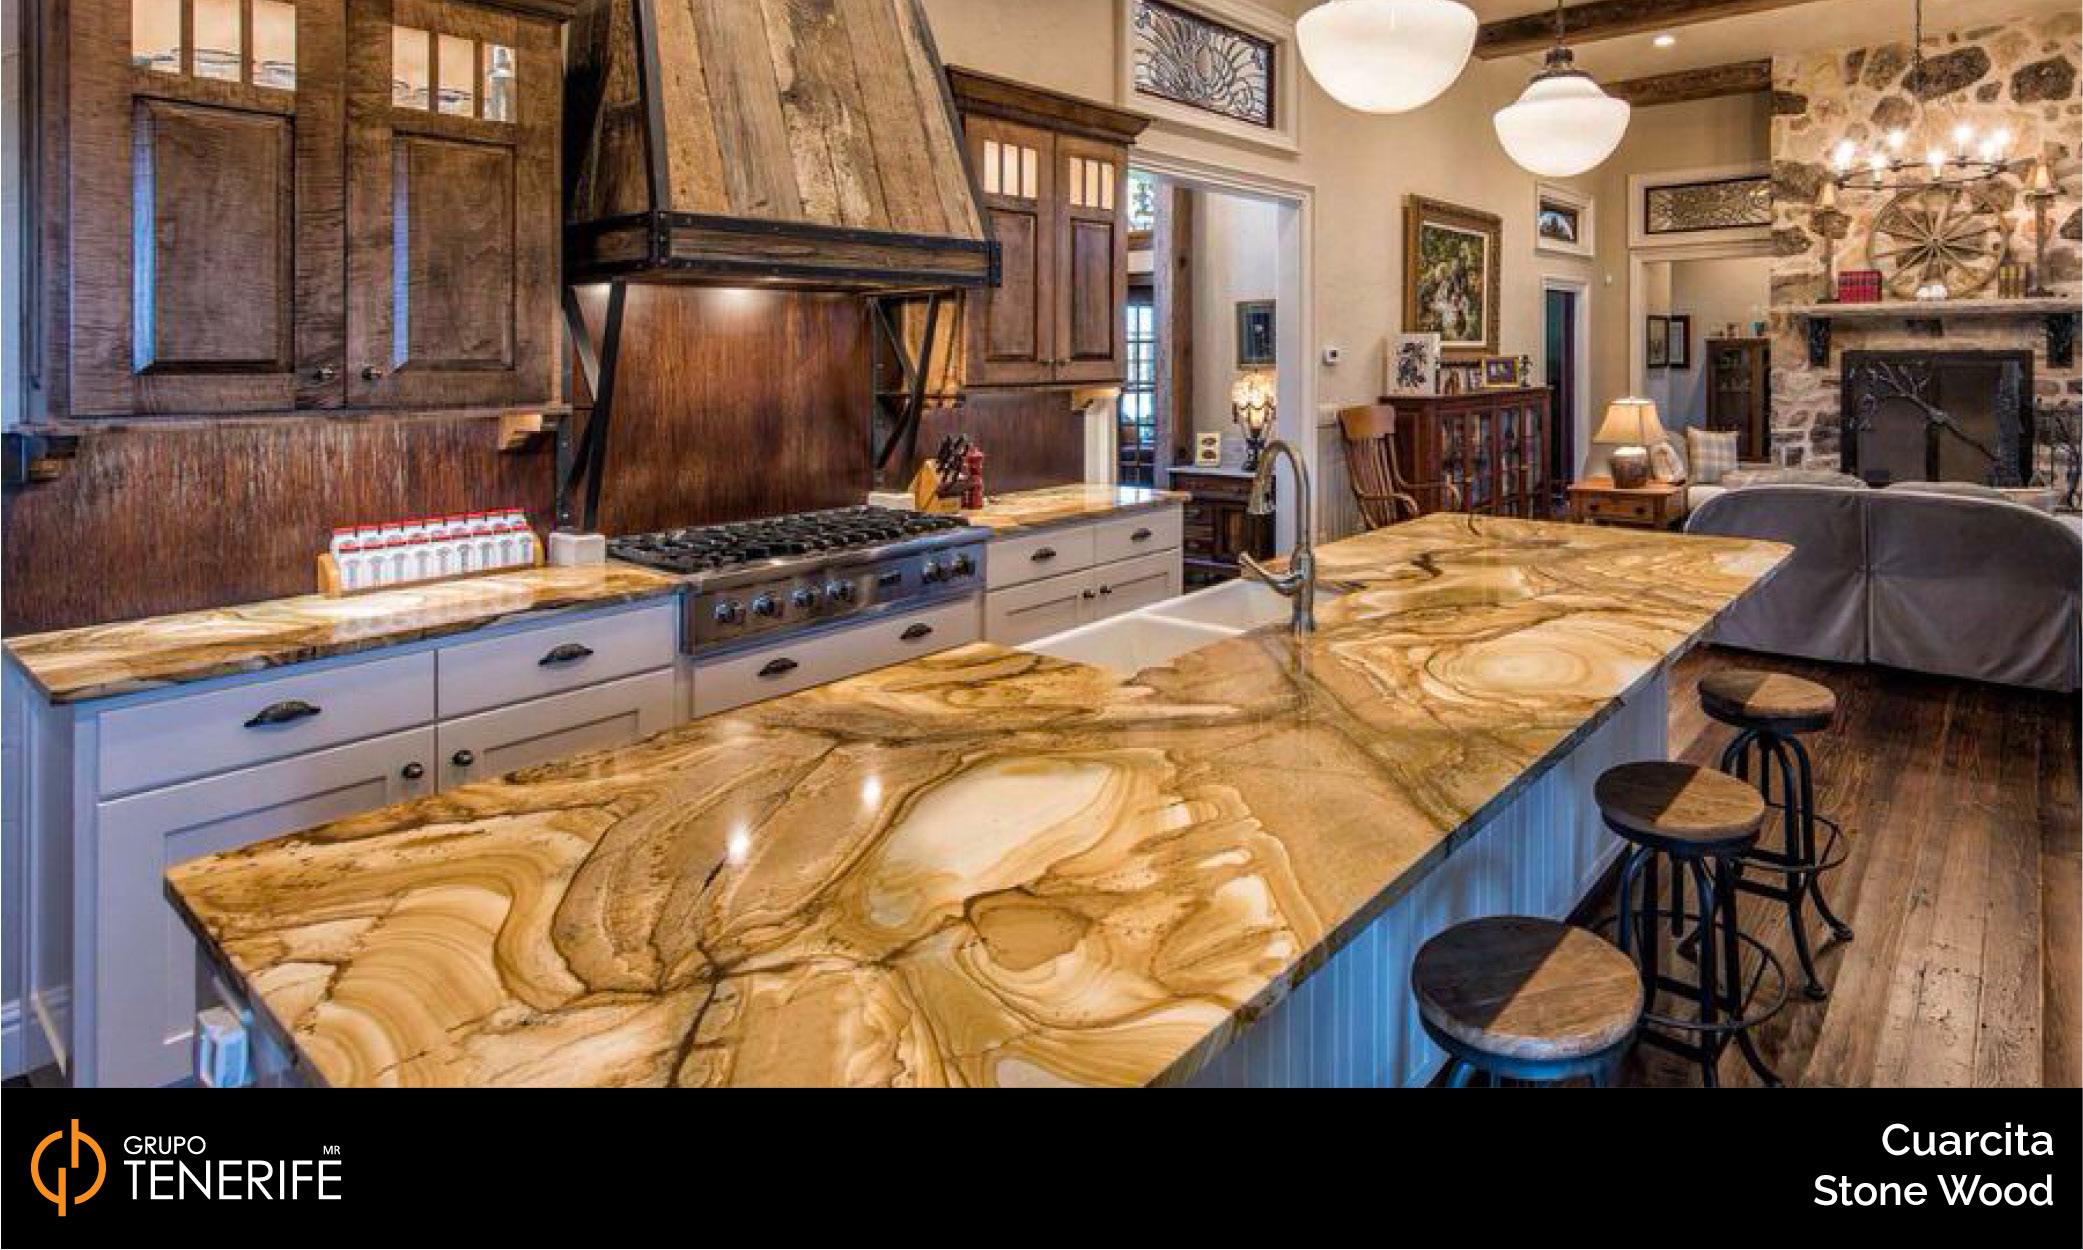 cuarcita stone wood